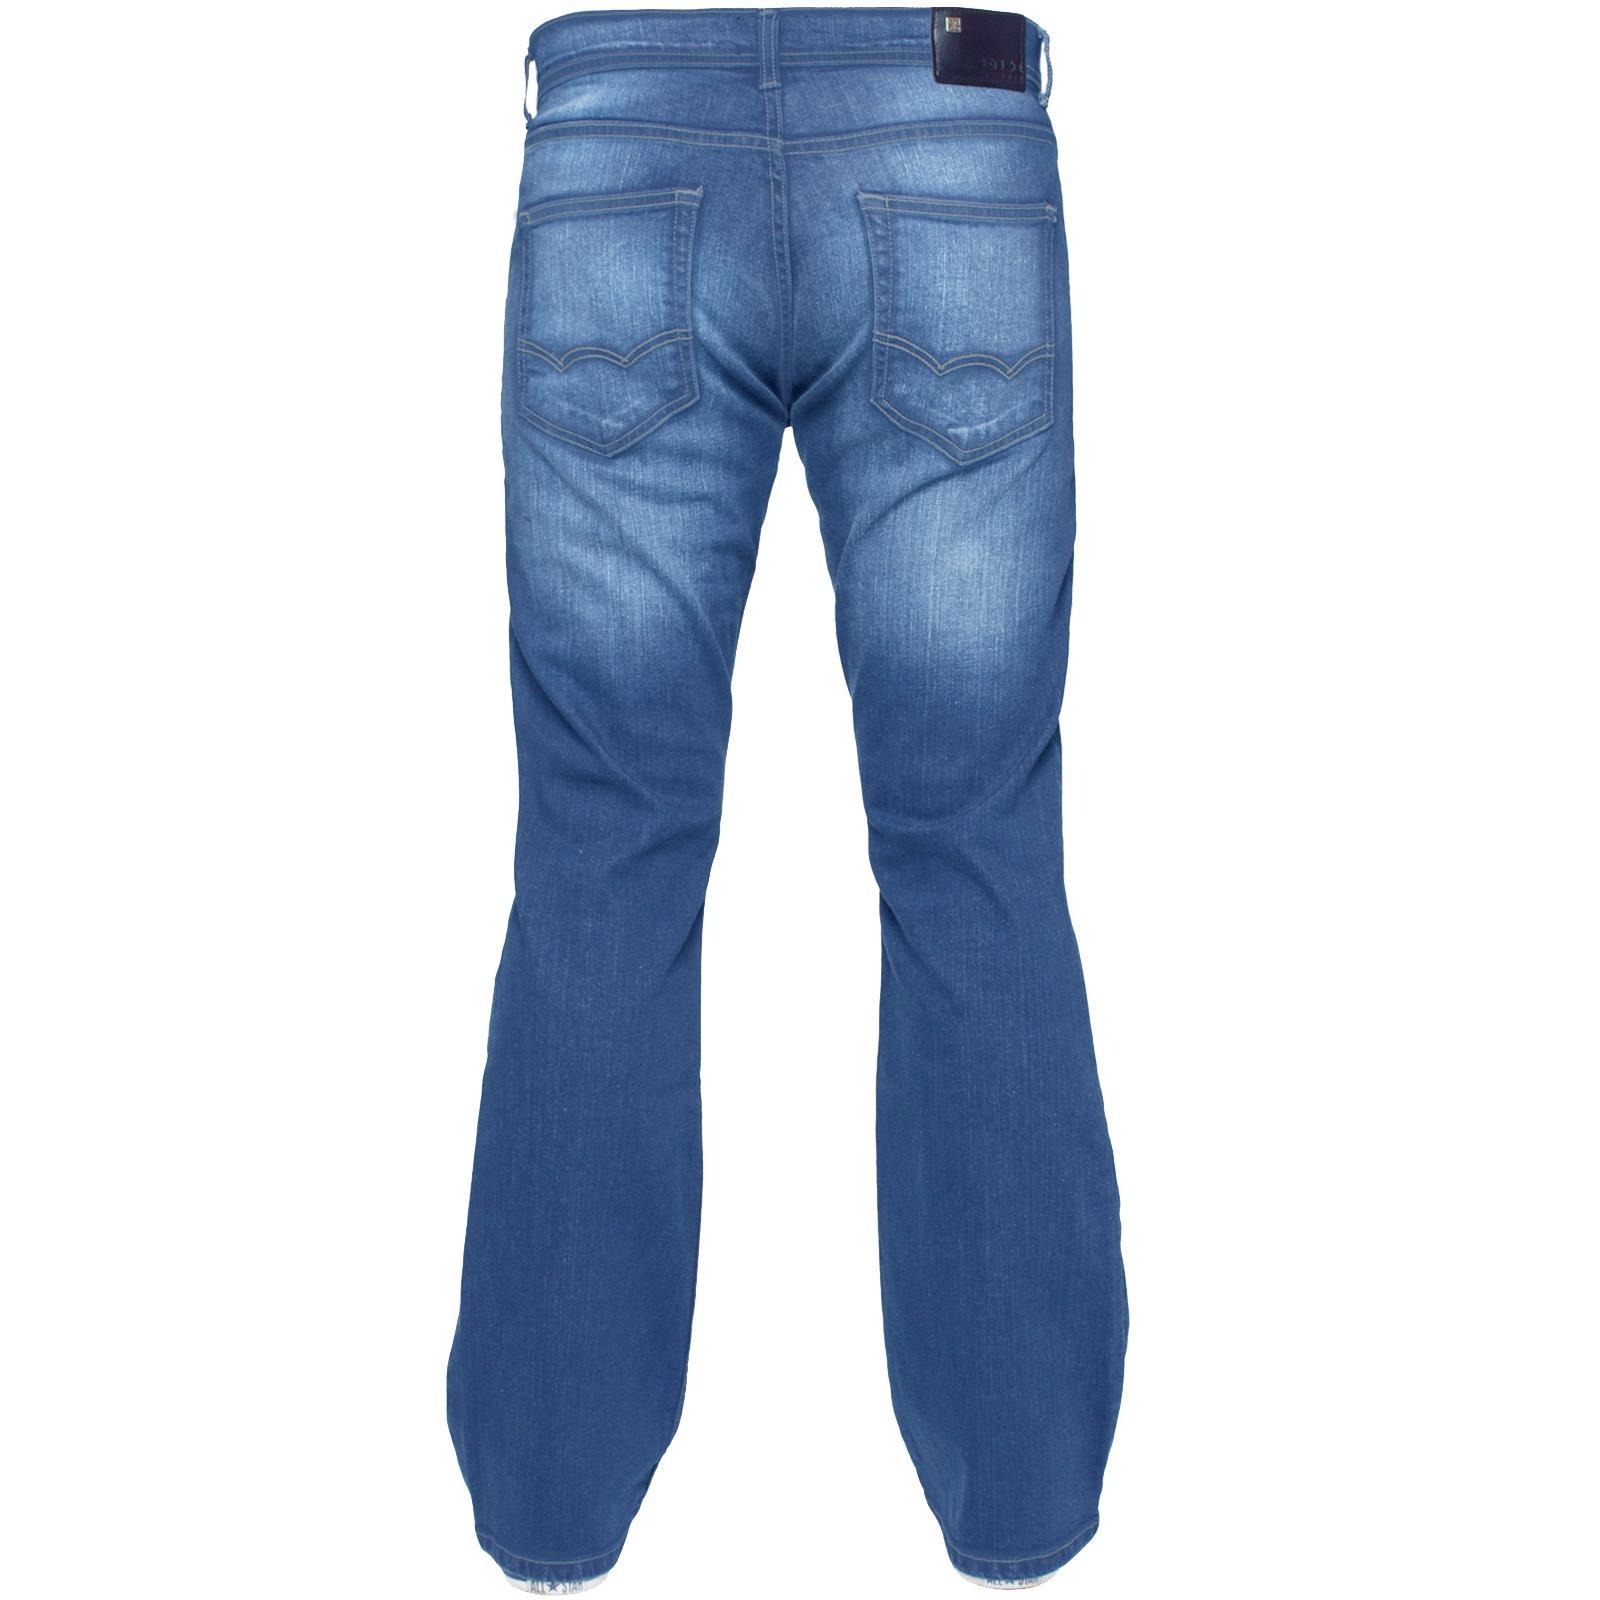 Para-Hombre-Recto-Bootcut-Stretch-Jeans-Pantalones-Regular-Fit-Grande-Alto-Todas-Cinturas miniatura 45